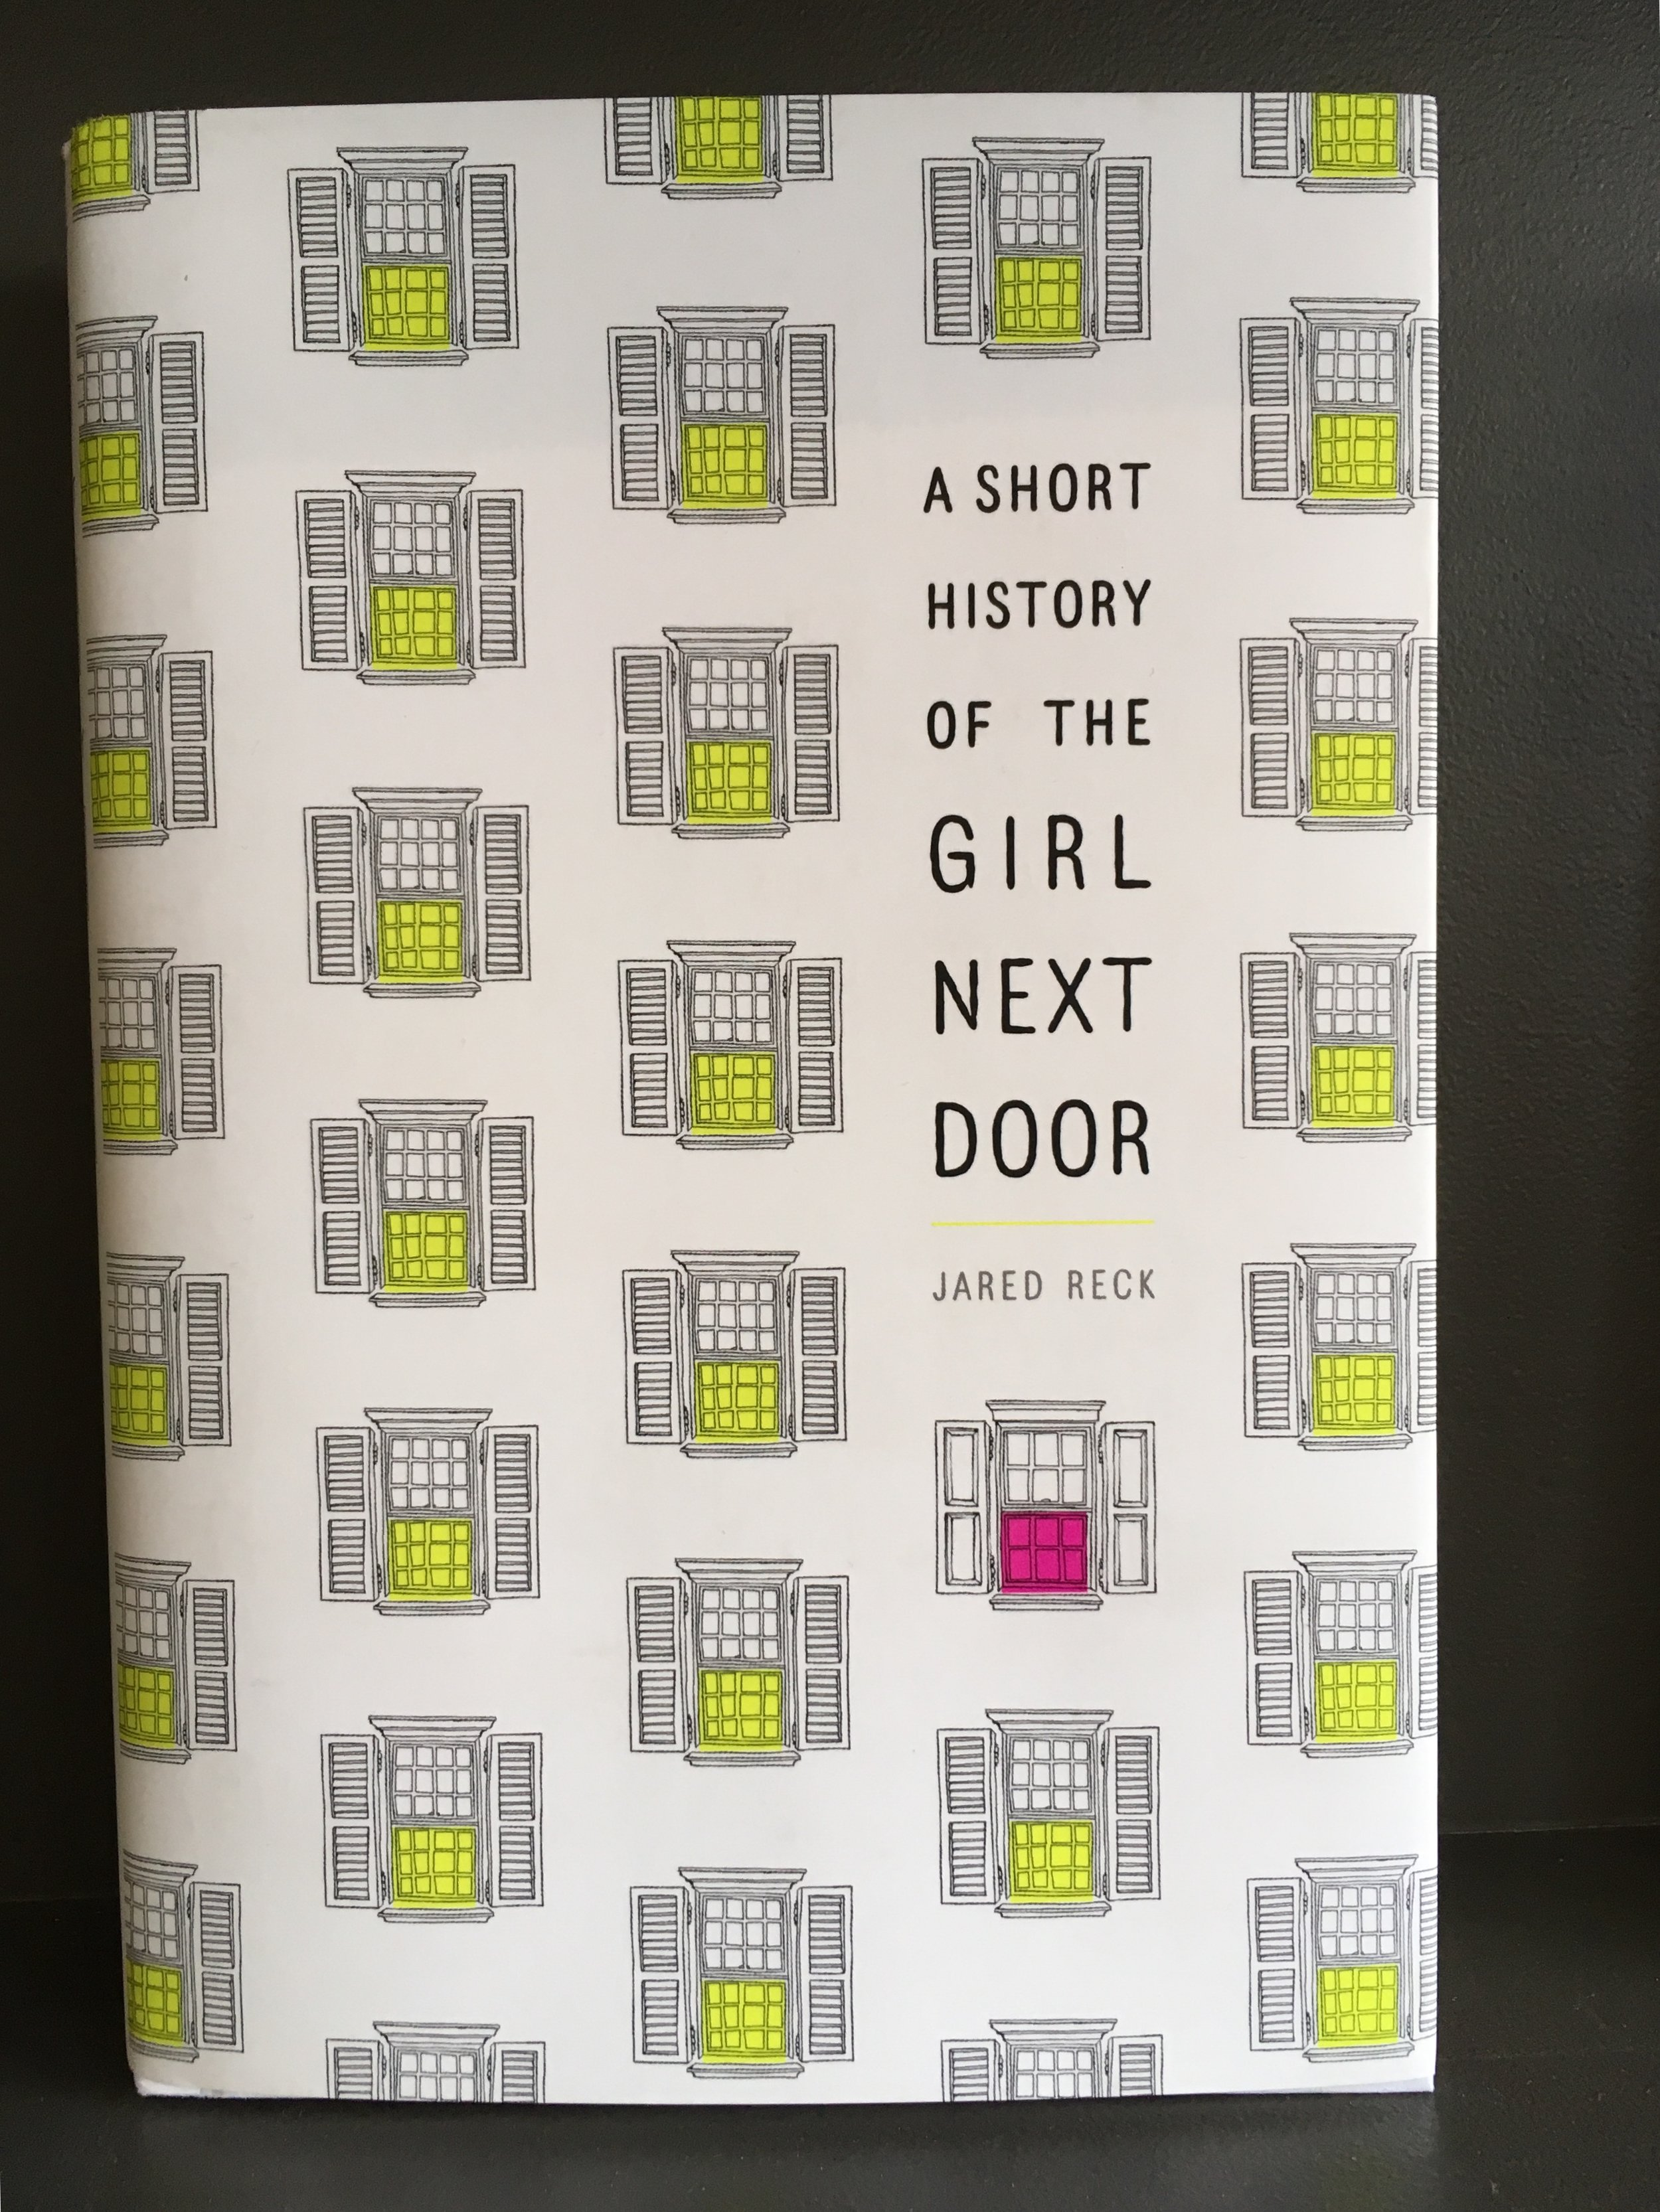 A Short History of the Girl Next Door - Jared Reck